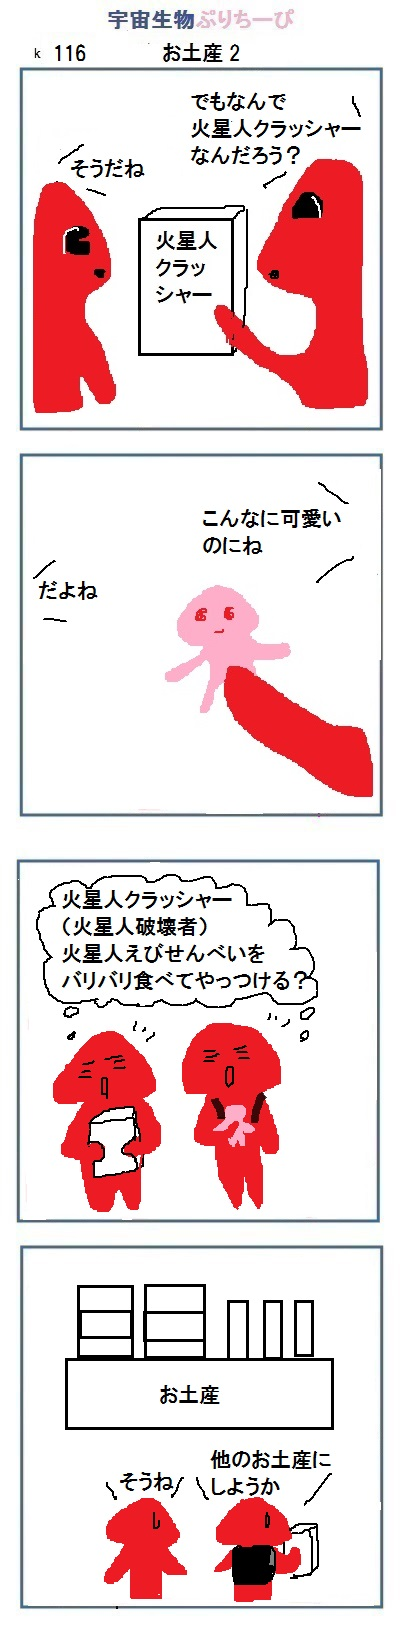 160929_k116.jpg